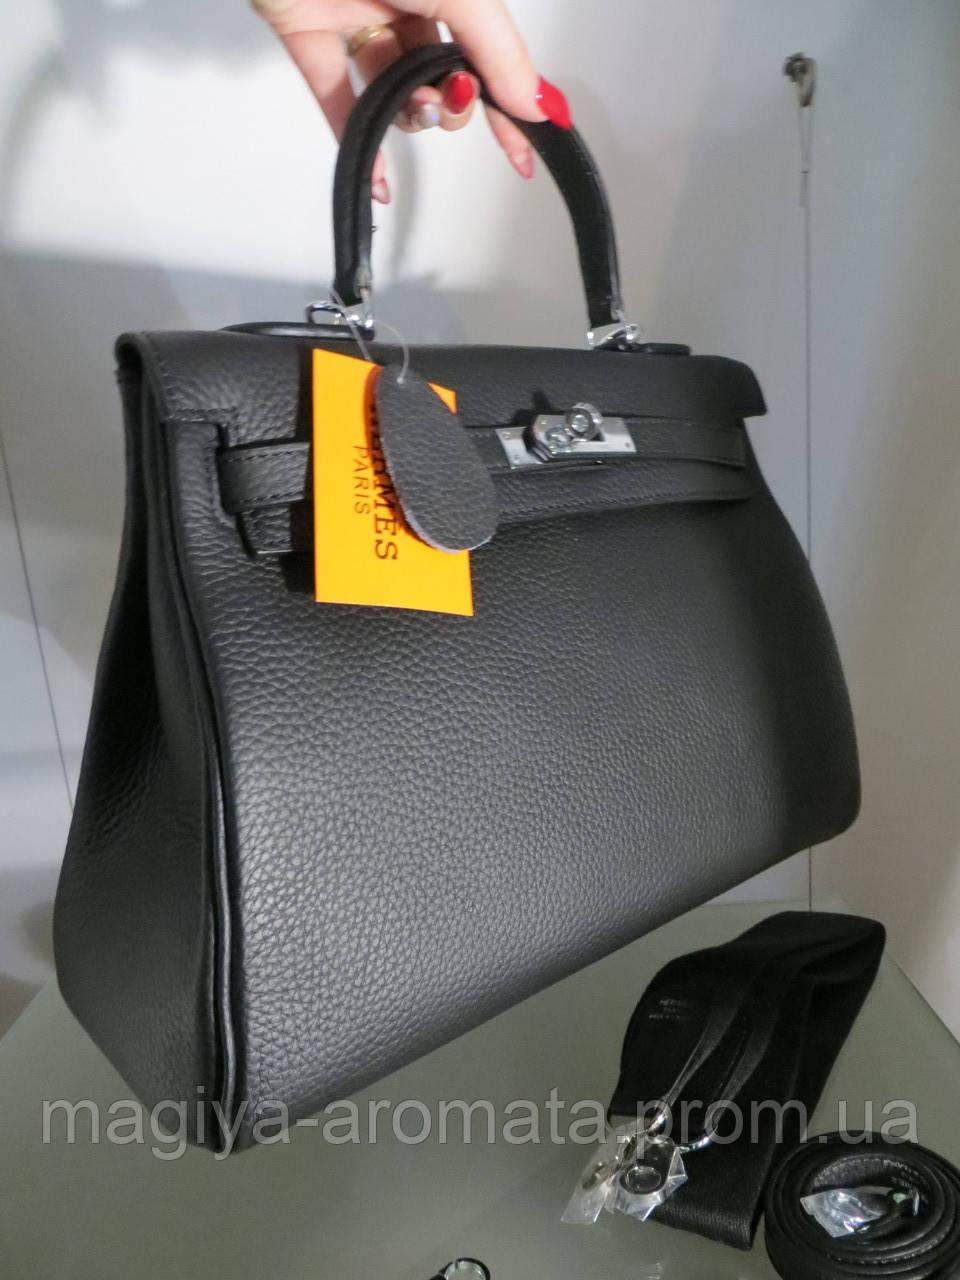 4ca9115e4e3c РУЧНАЯ РАБОТА. КОЖА ТОГО. Женская сумка Hermes Kelly 28 черная ...